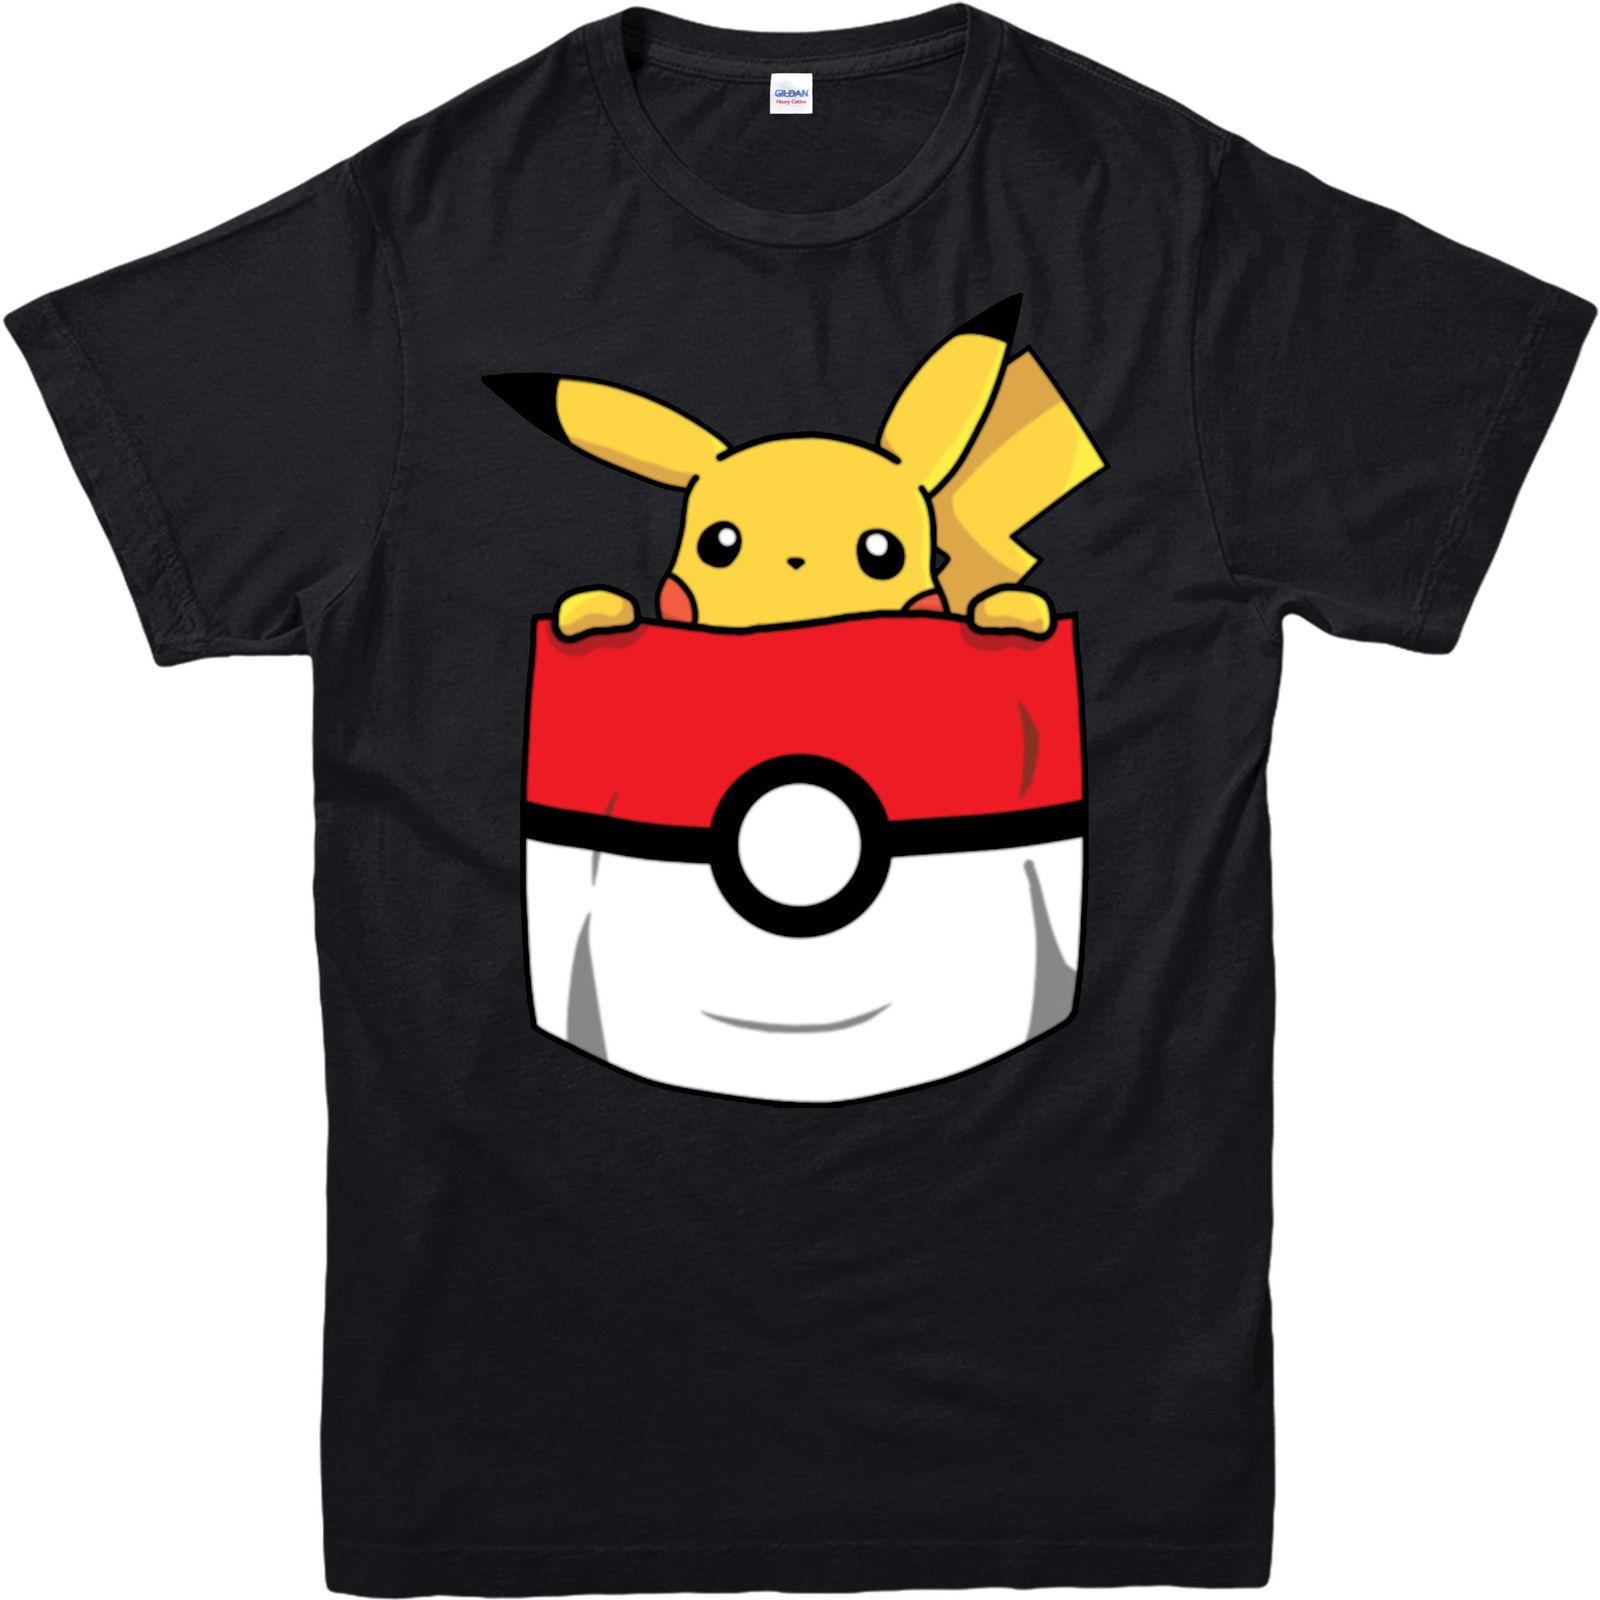 font-b-pokemon-b-font-t-shirtpikachu-pokeball-pocket-spoofadult-and-kids-sizes-t-shirt-novelty-cool-tops-men's-short-sleeve-tshirt